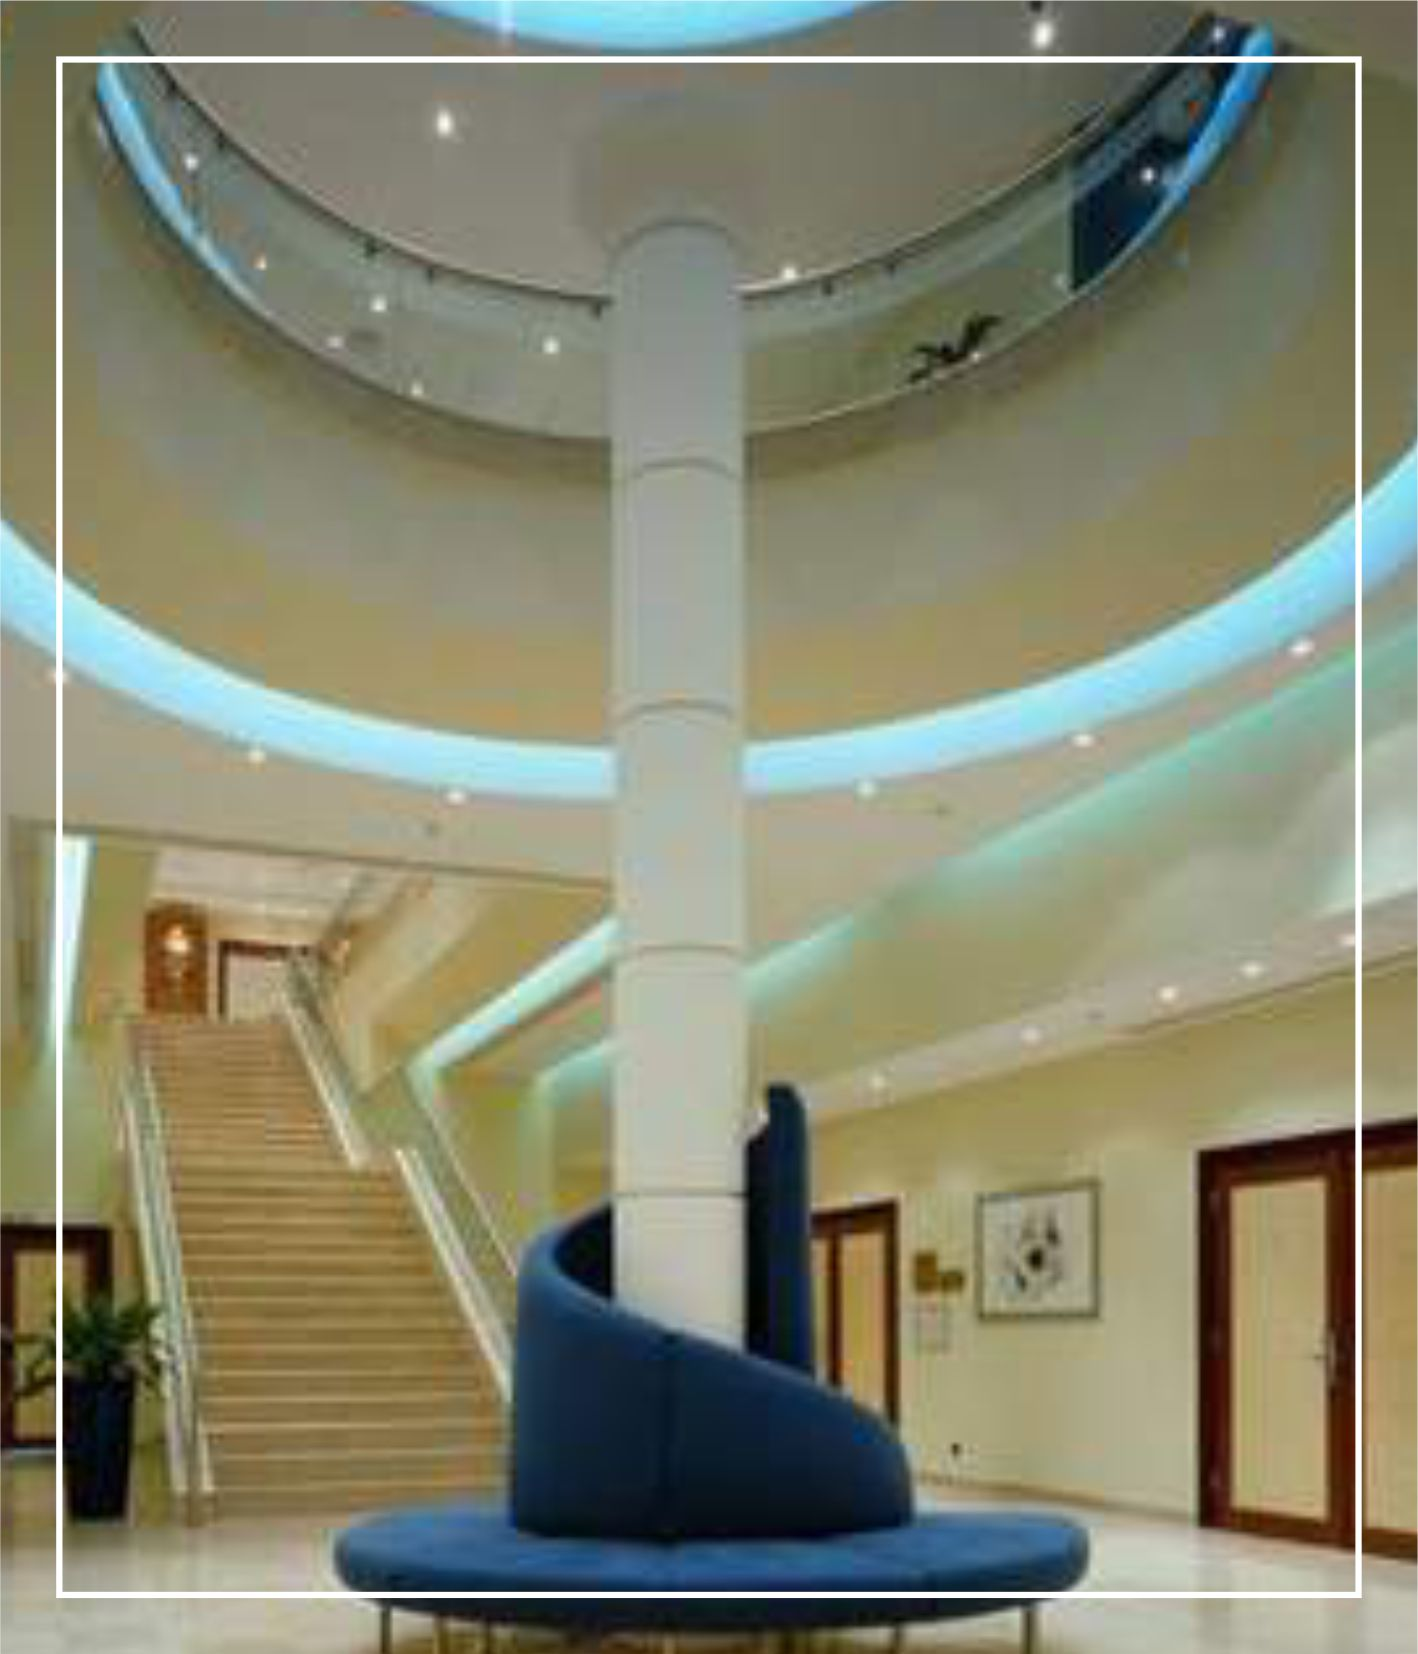 Paraskevi-interior-design-images-27